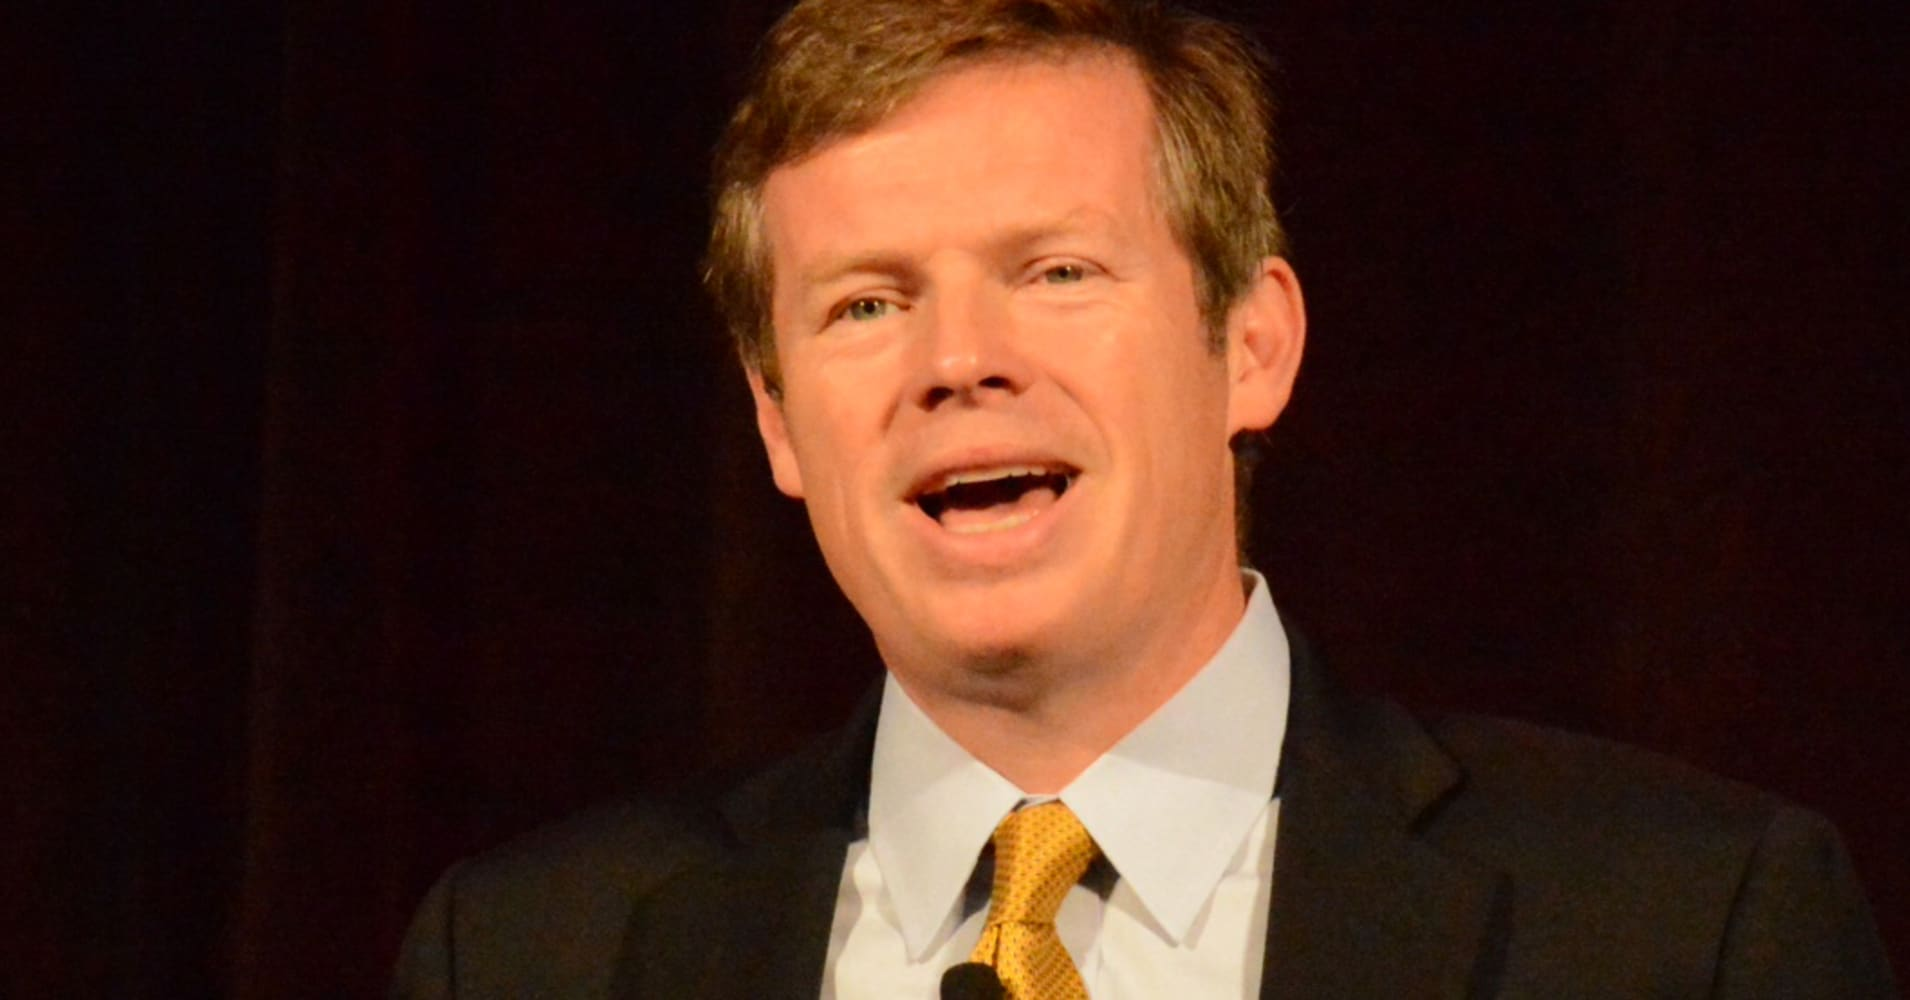 Bootstrap Business J P Morgan Quotes: J.P. Morgan's Kelly Warns Of 'miserably Slow' Growth